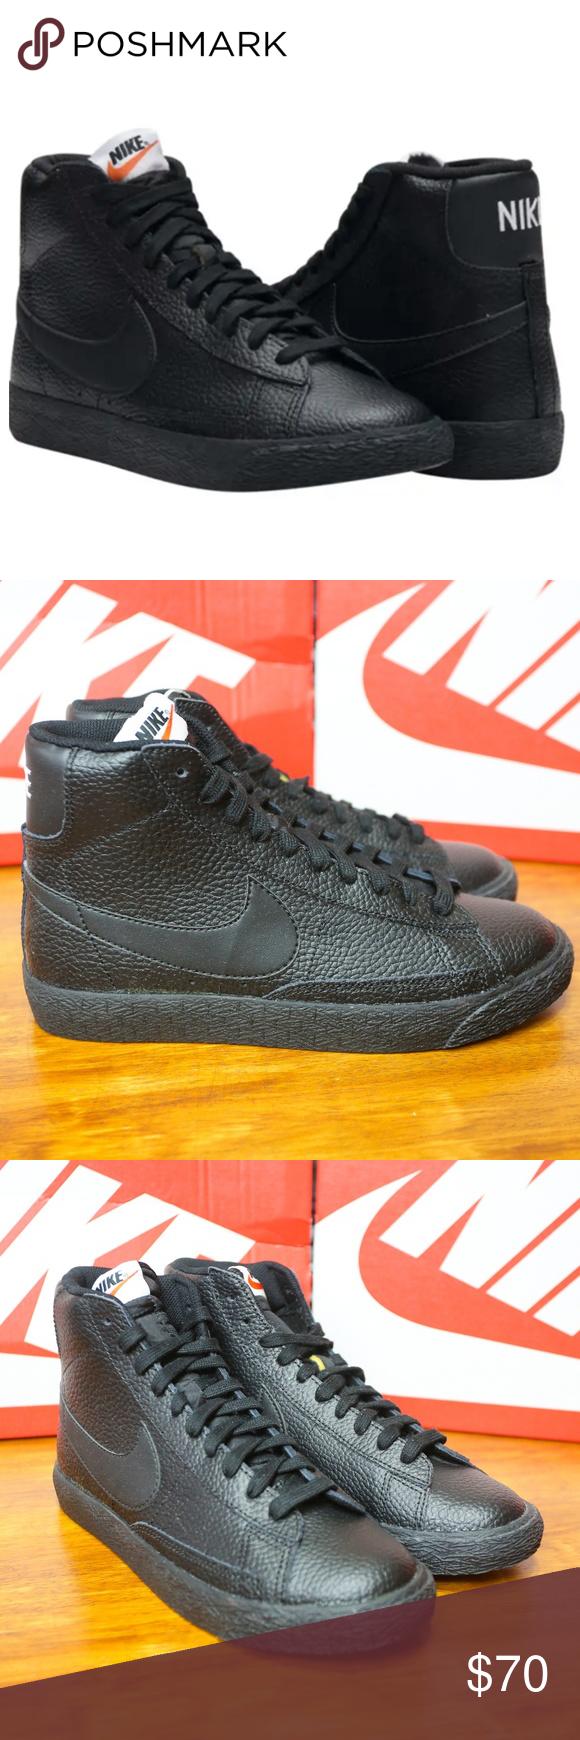 Nike Blazer Mid Gs Black White Gum 895850 001 Size 5.5